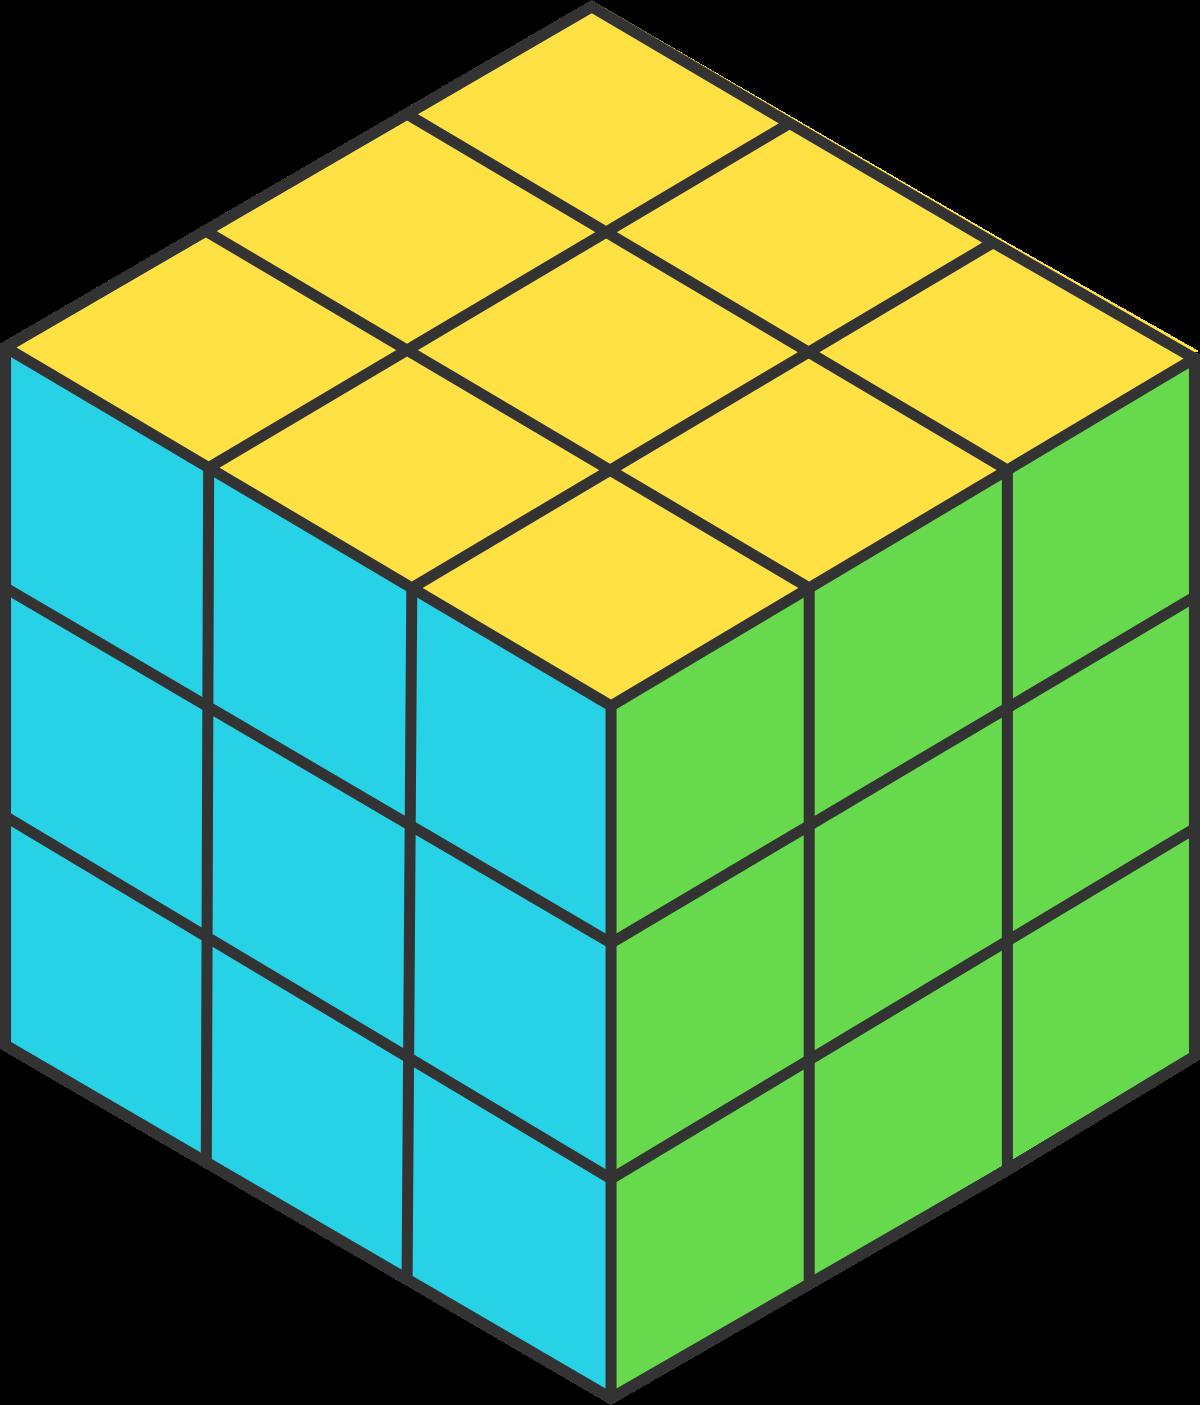 One unit cube